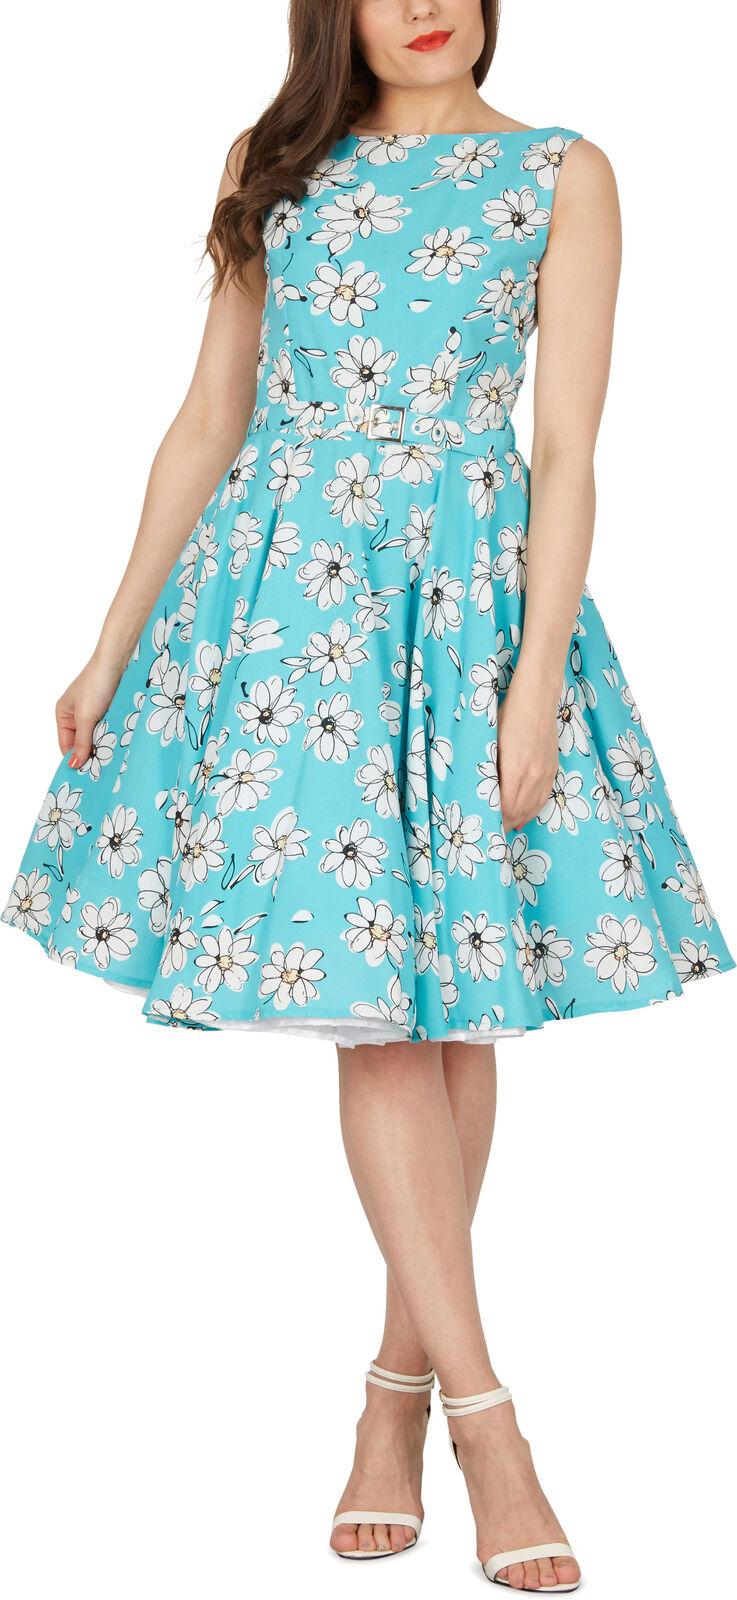 Floreale 'Audrey' Vintage Daisy vintage anni'50 Rockabilly Swing Prom Dress